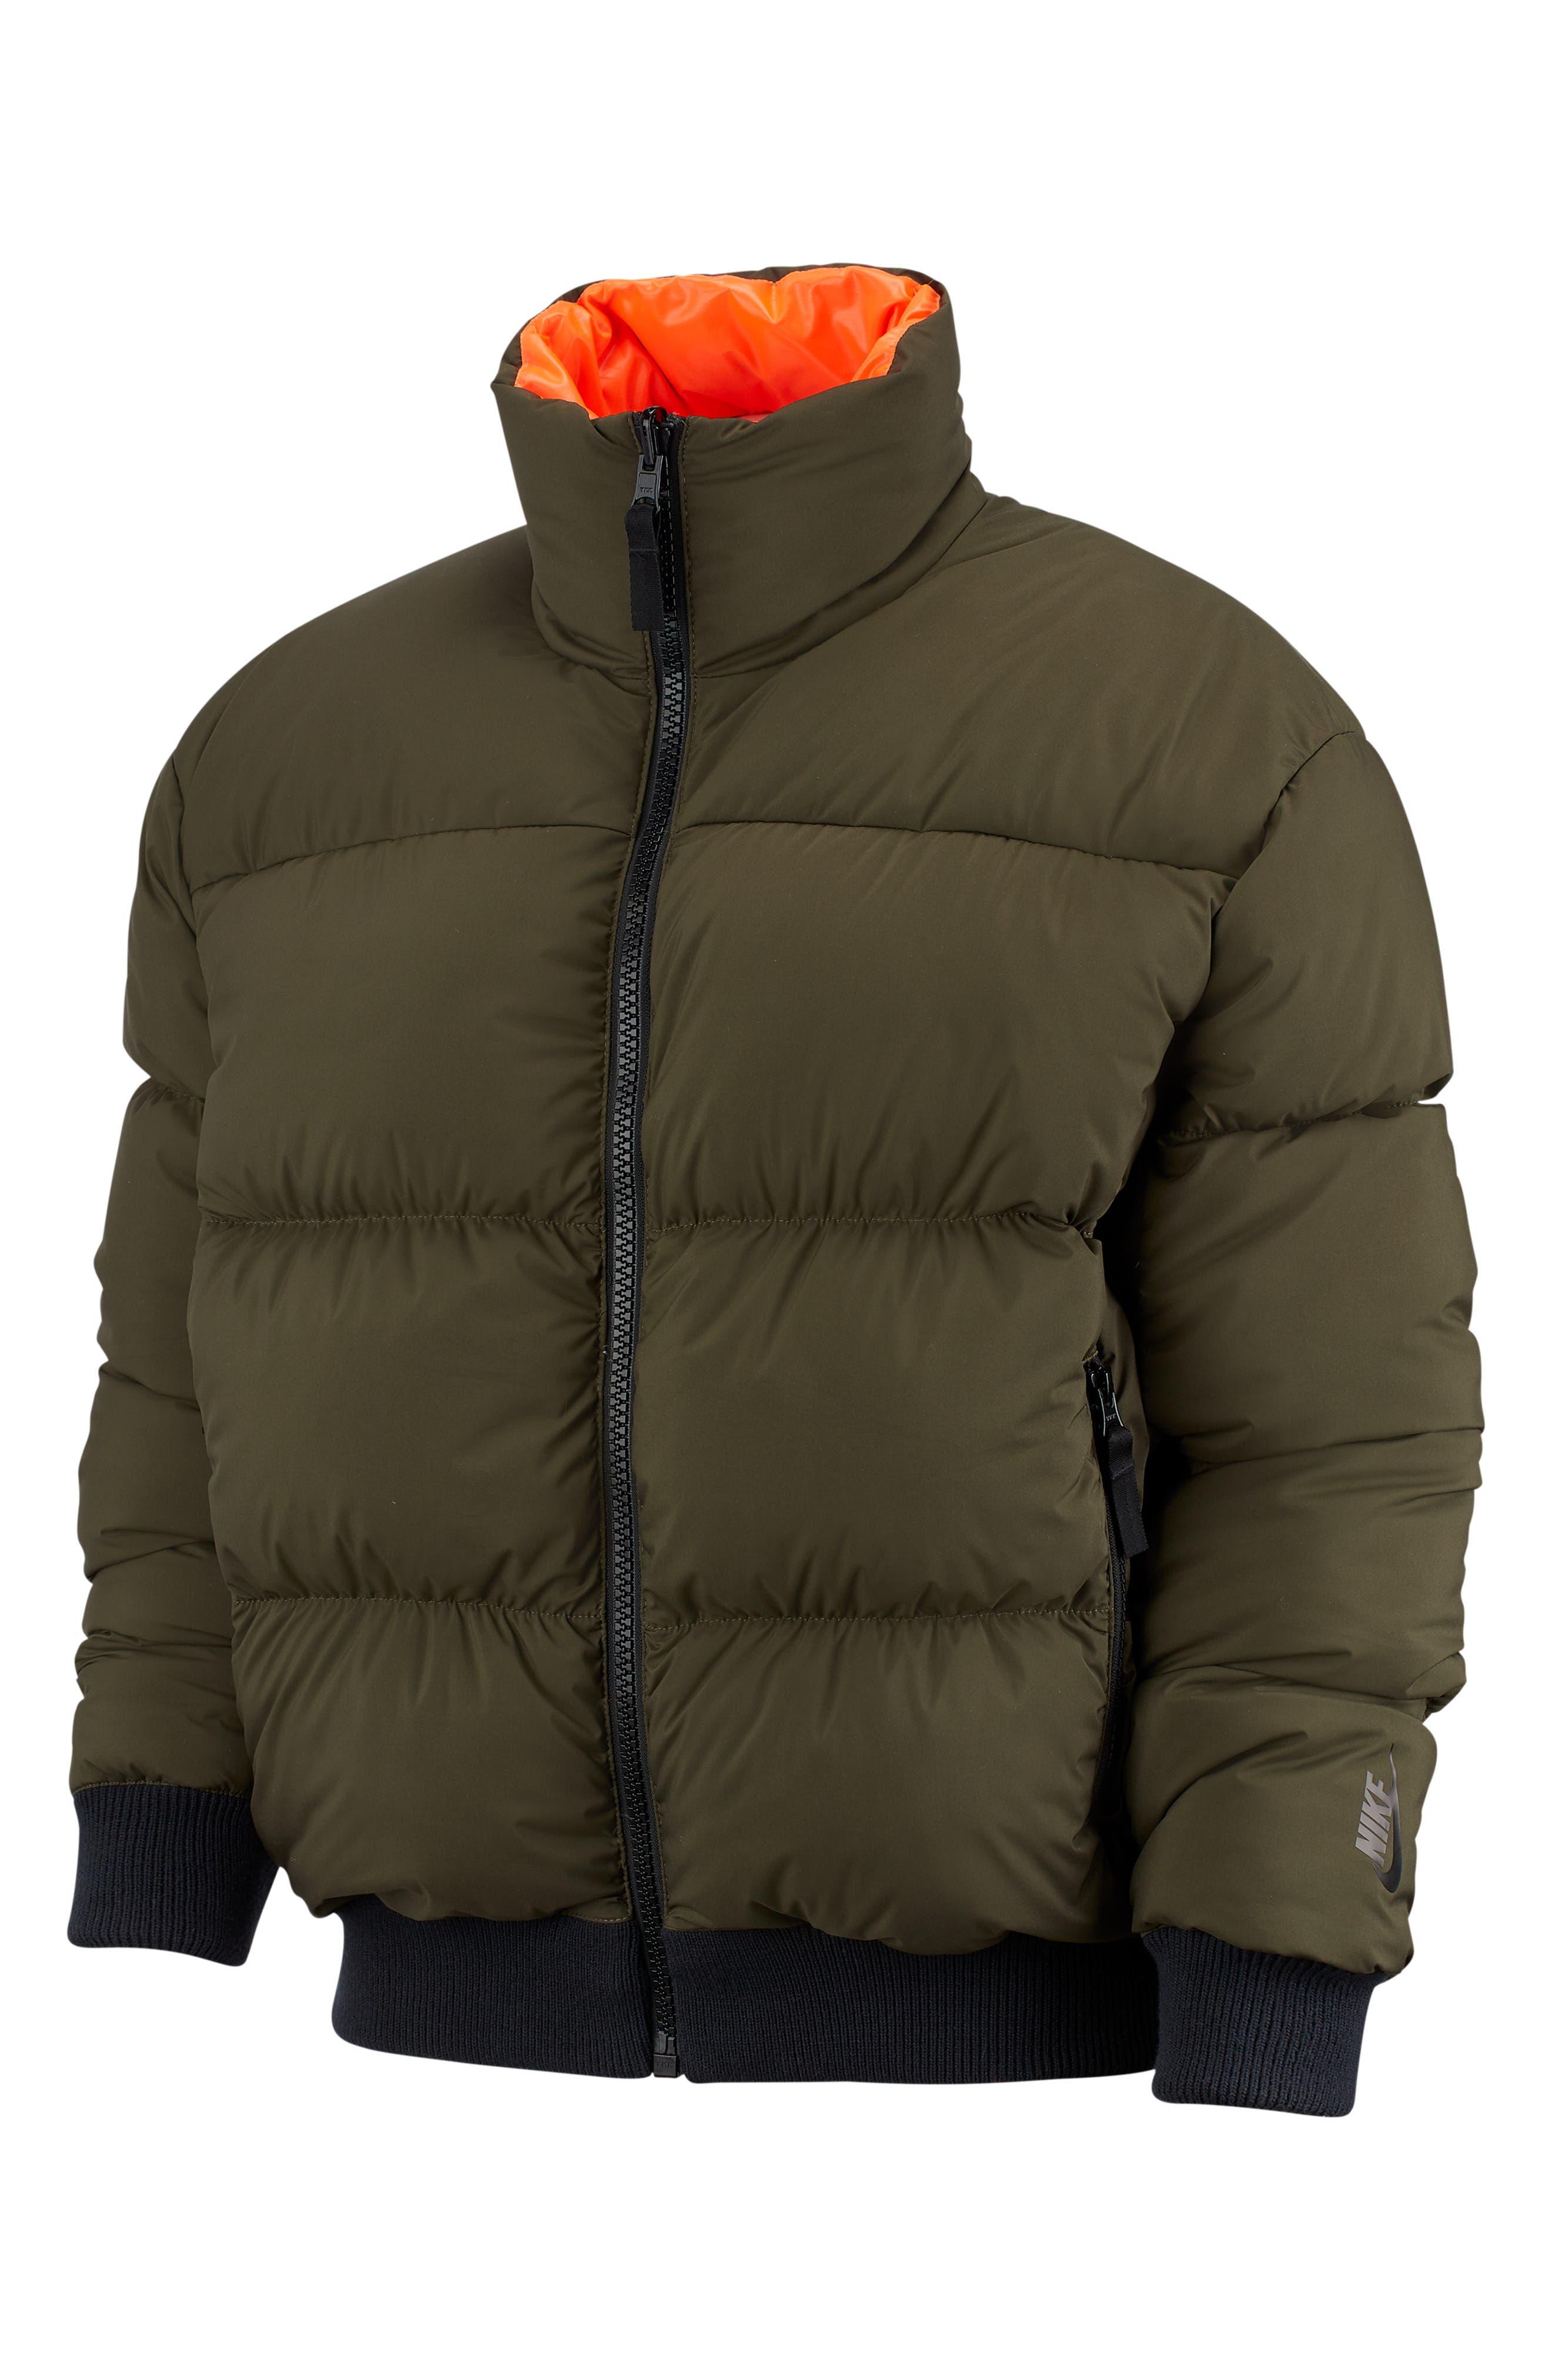 Nike Nrg Reversible Down Fill Puffer Jacket, Green